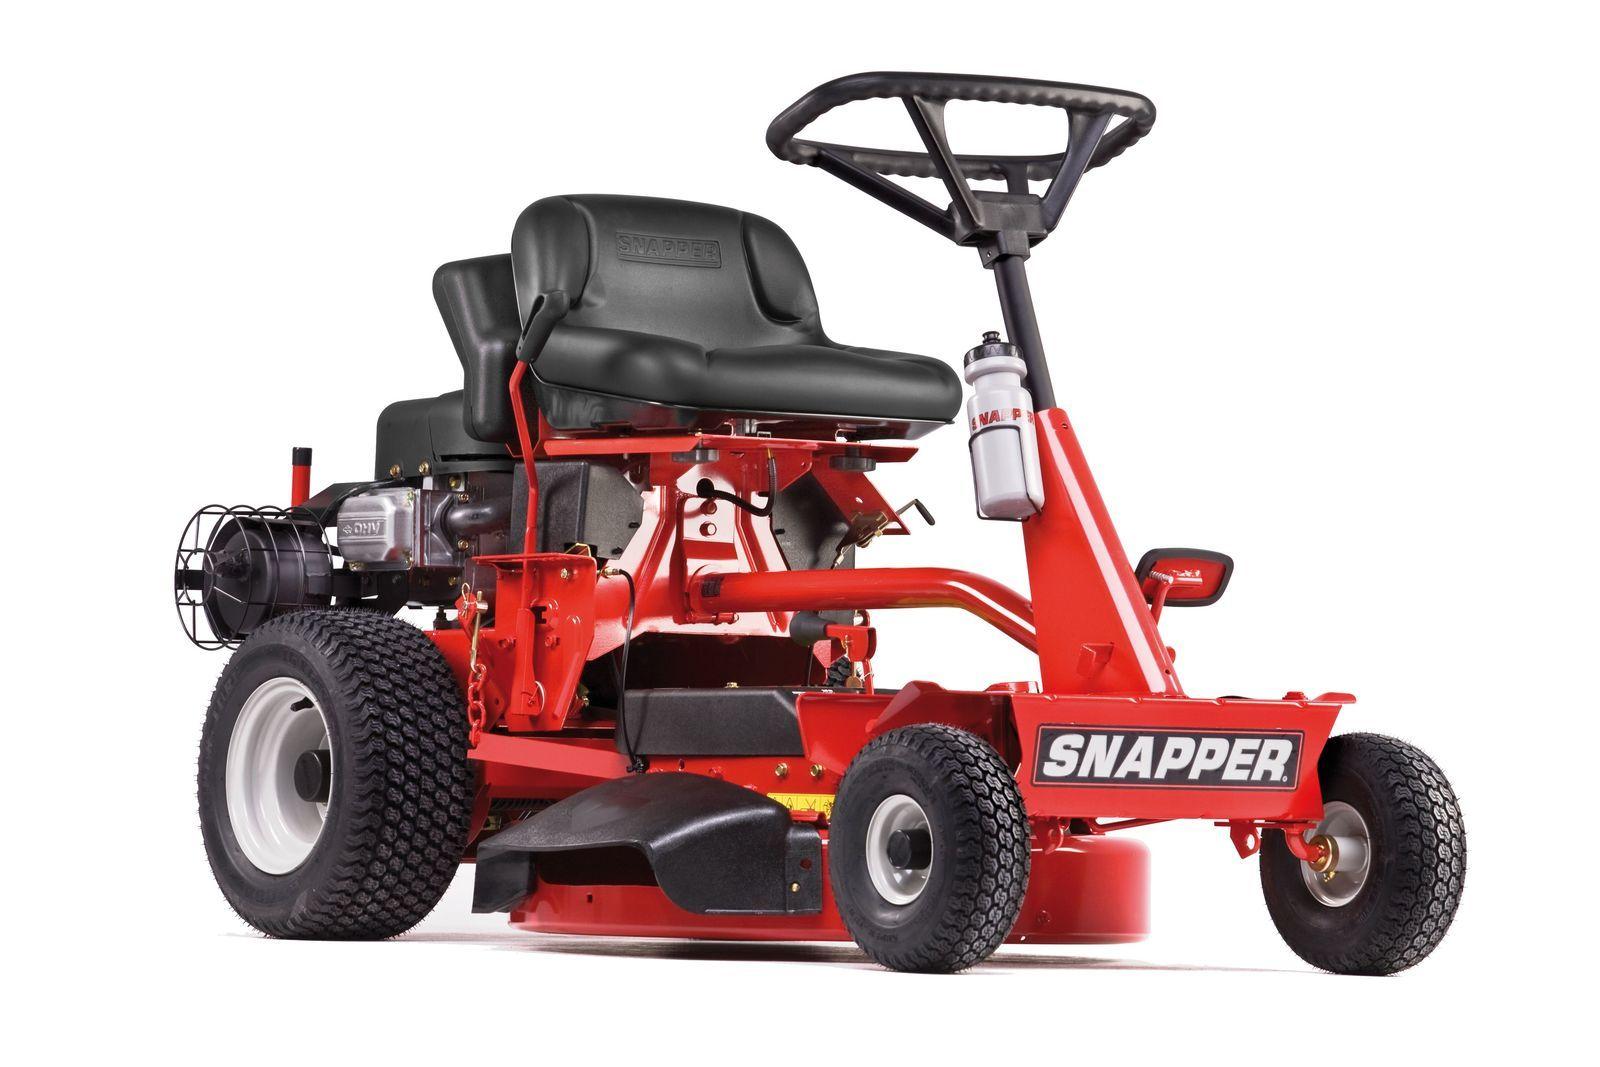 Snapper Rider E2813523bve Gabiot Motoculture Louvroil